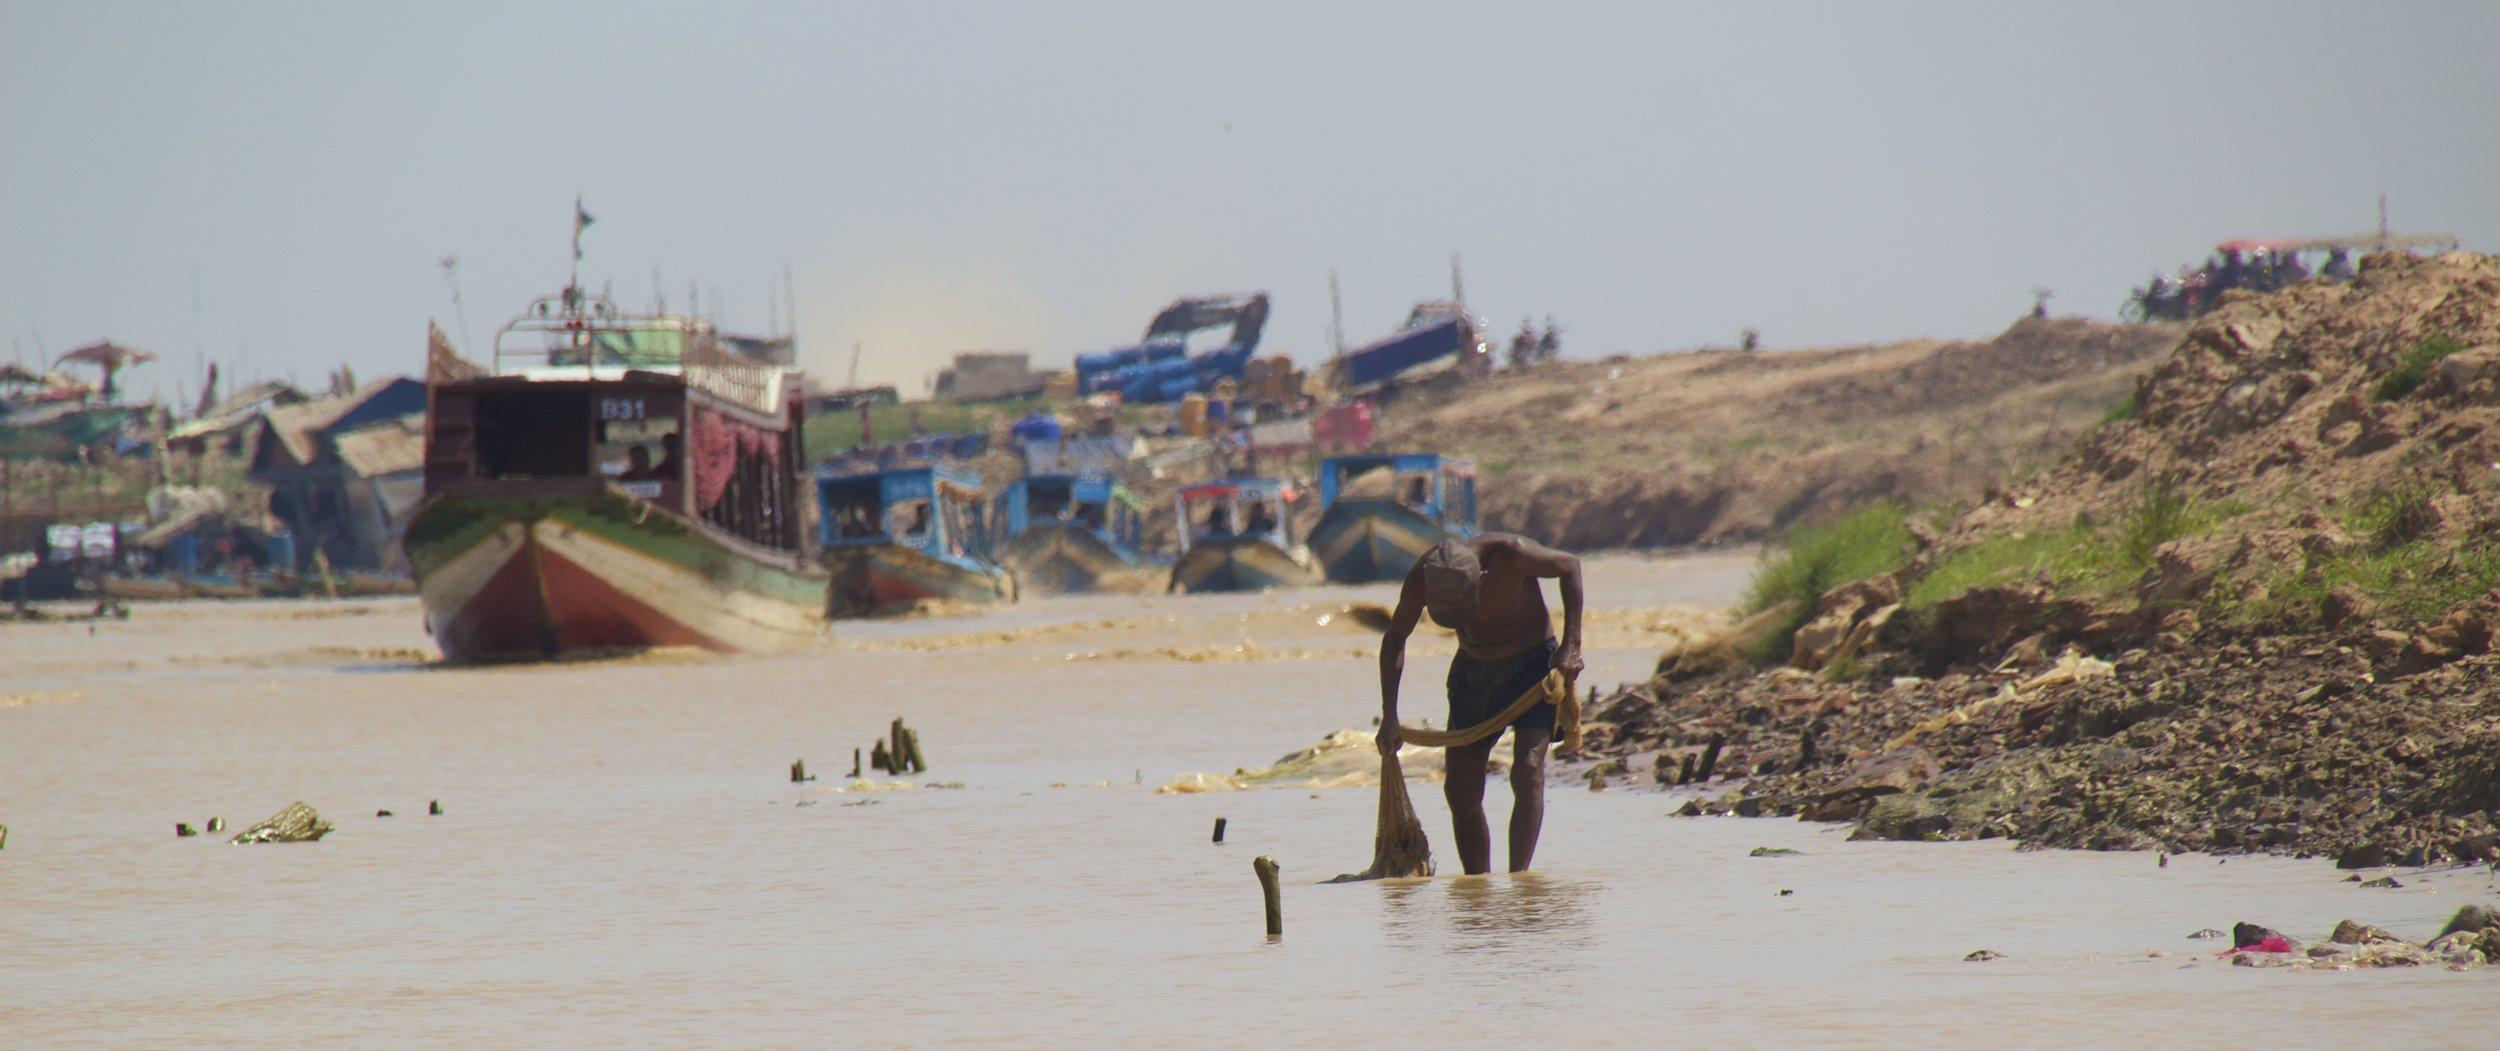 tonle sap siem reap cambodia floating villages 18.jpg